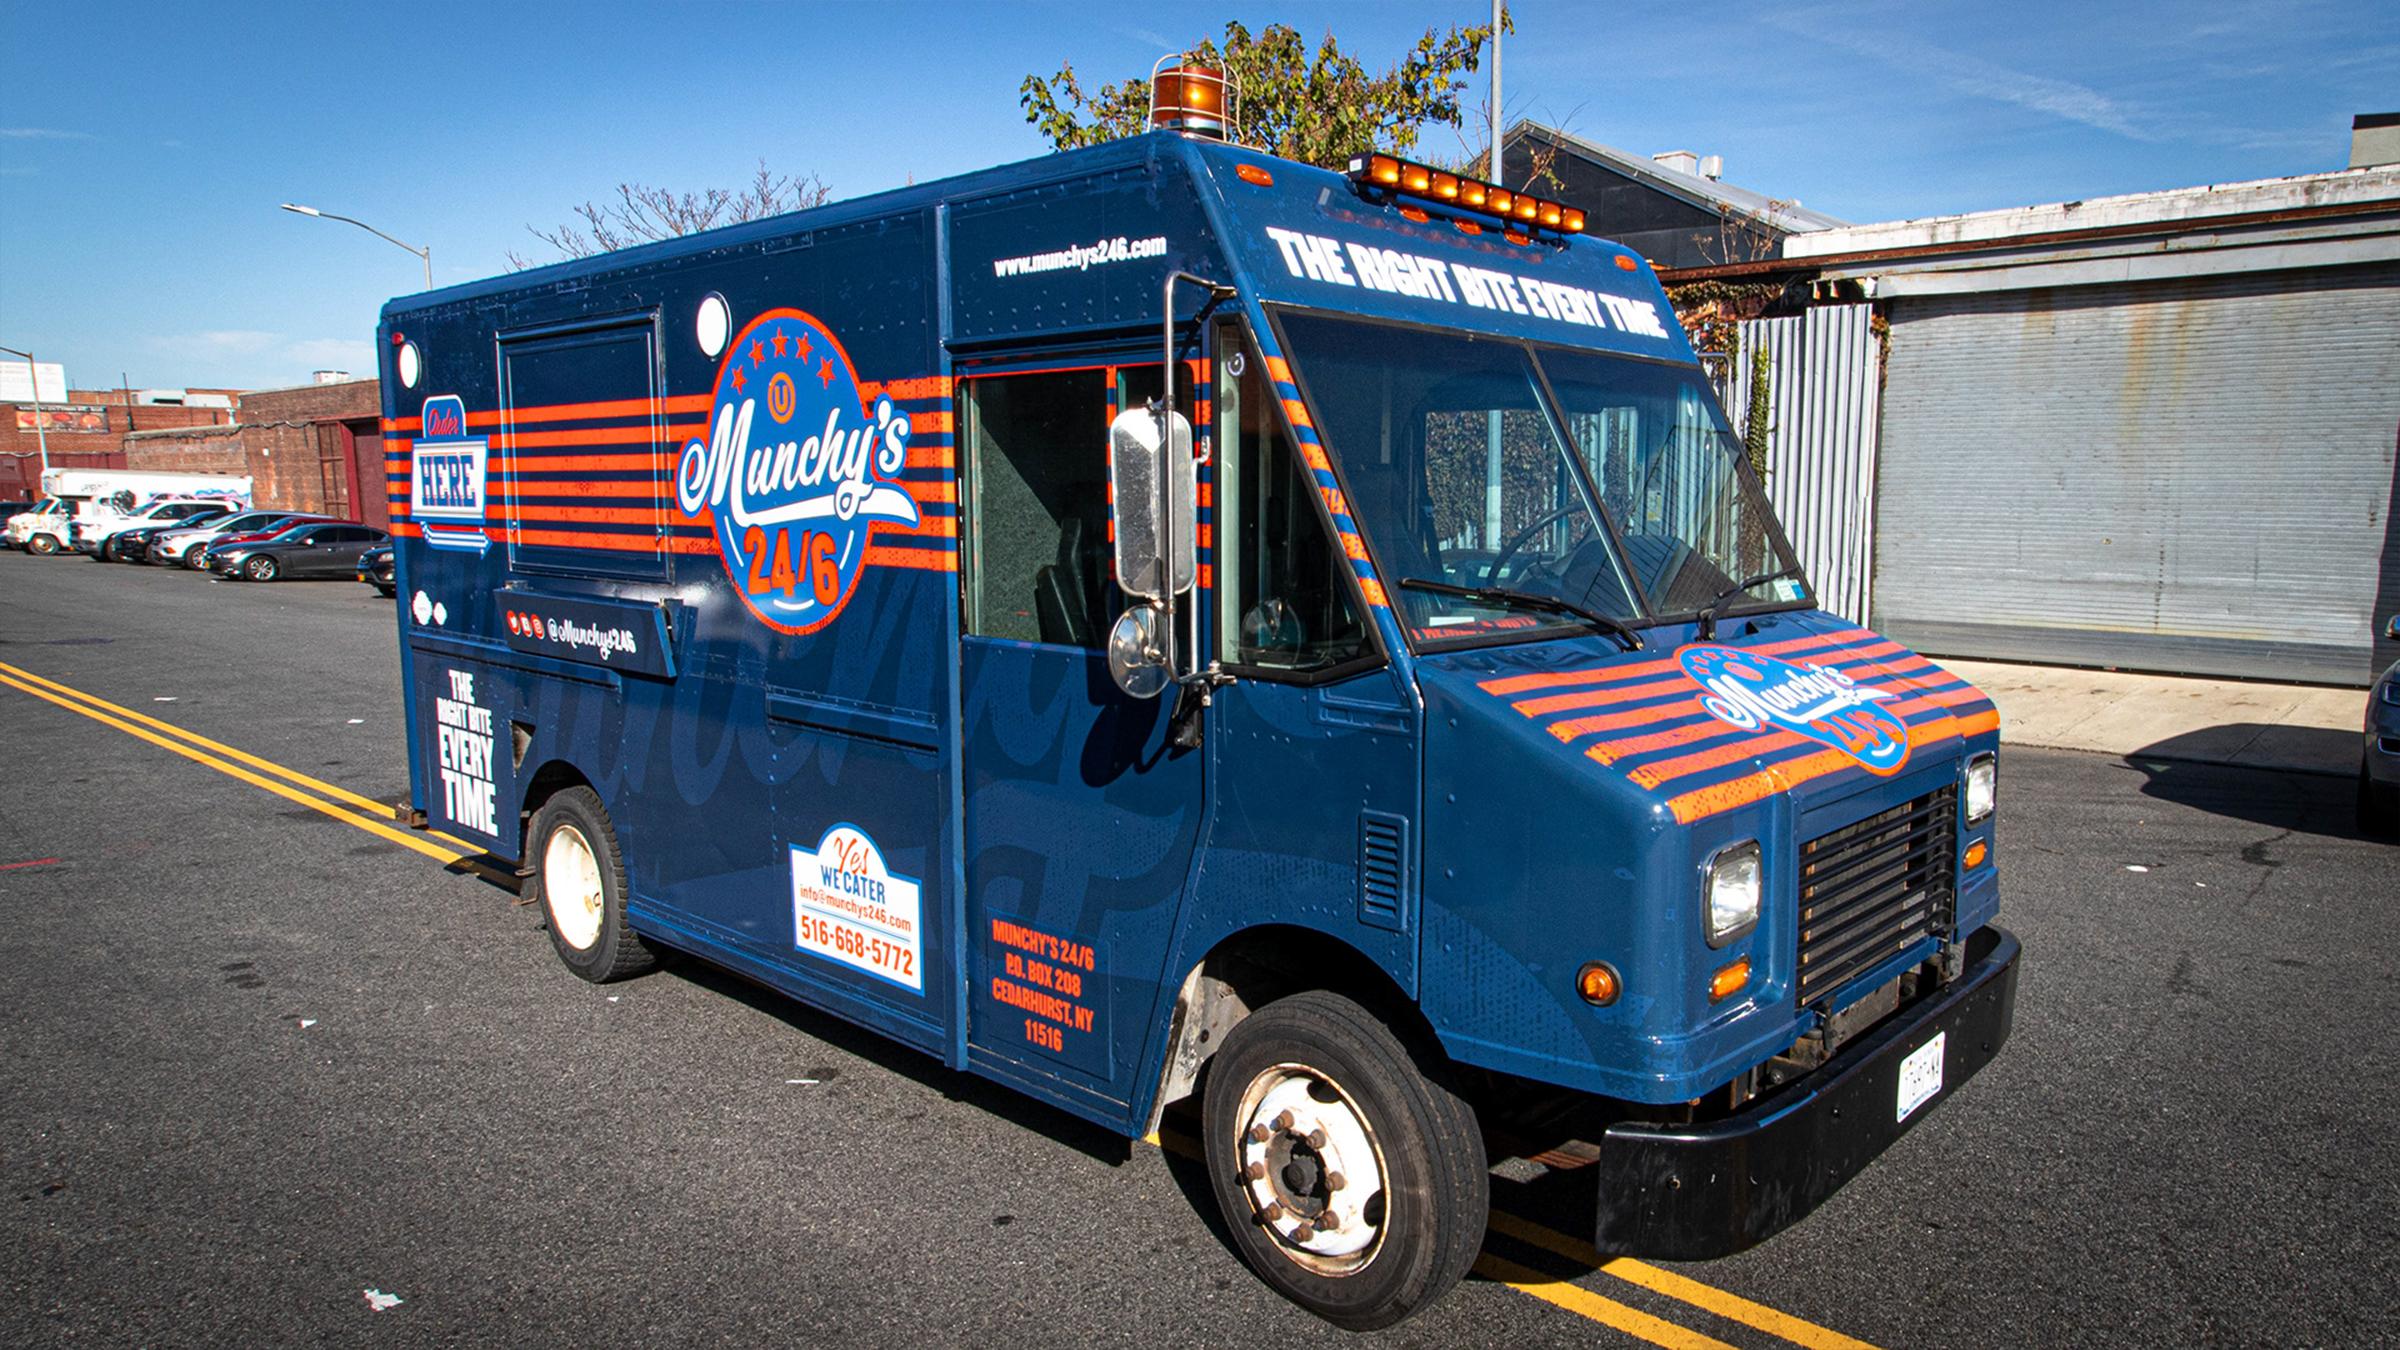 Munchy's 24/6 Branding & Food Truck Design